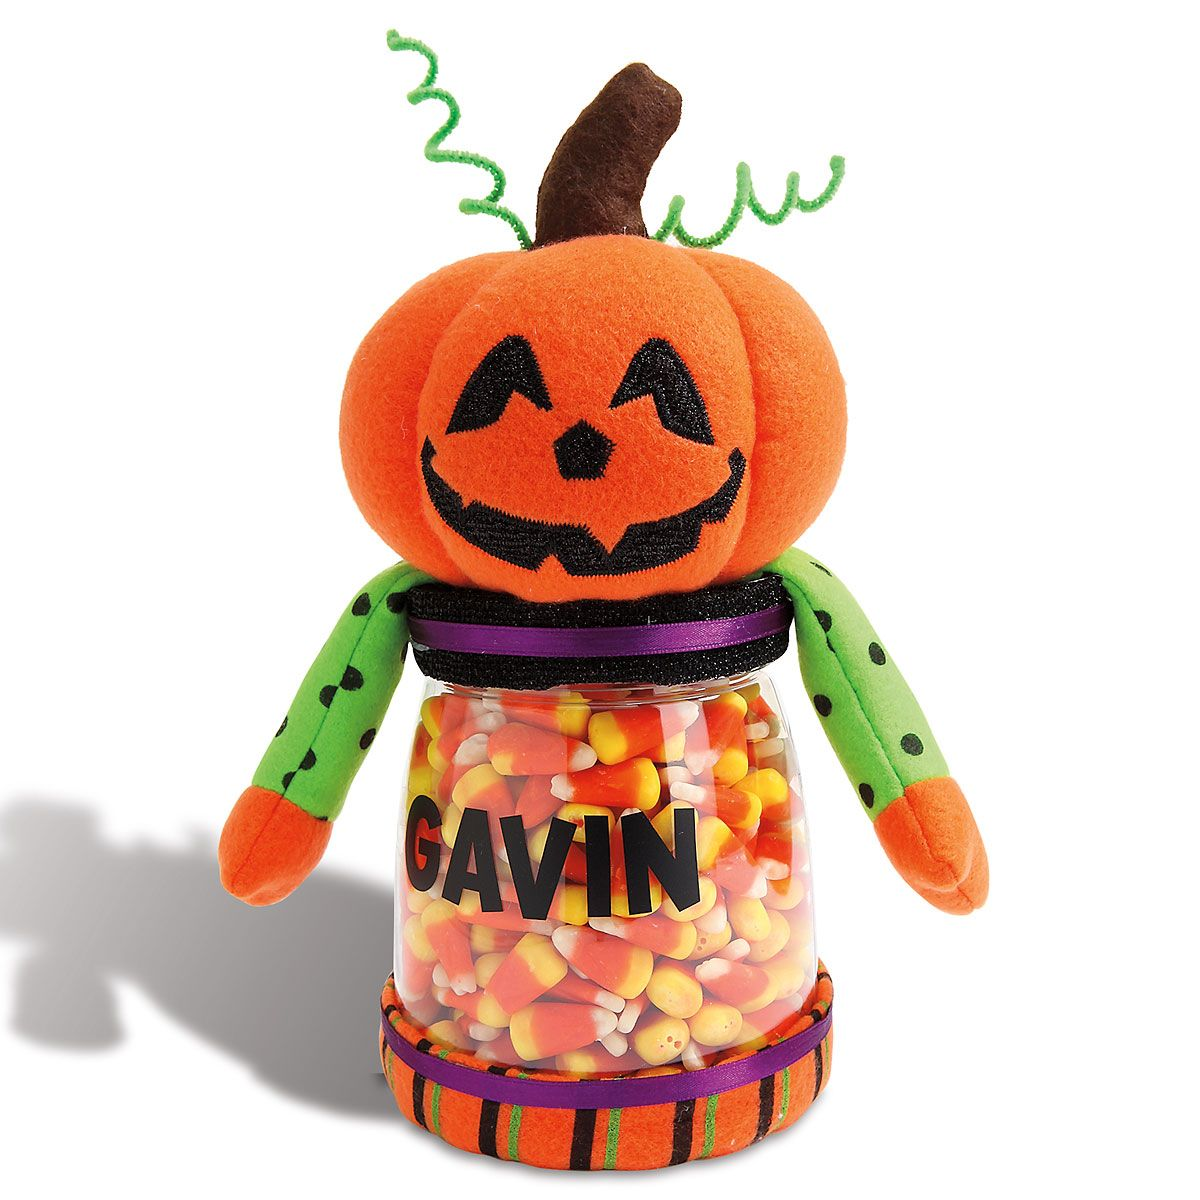 Personalized Halloween Jack-o-Lantern Treat Jar